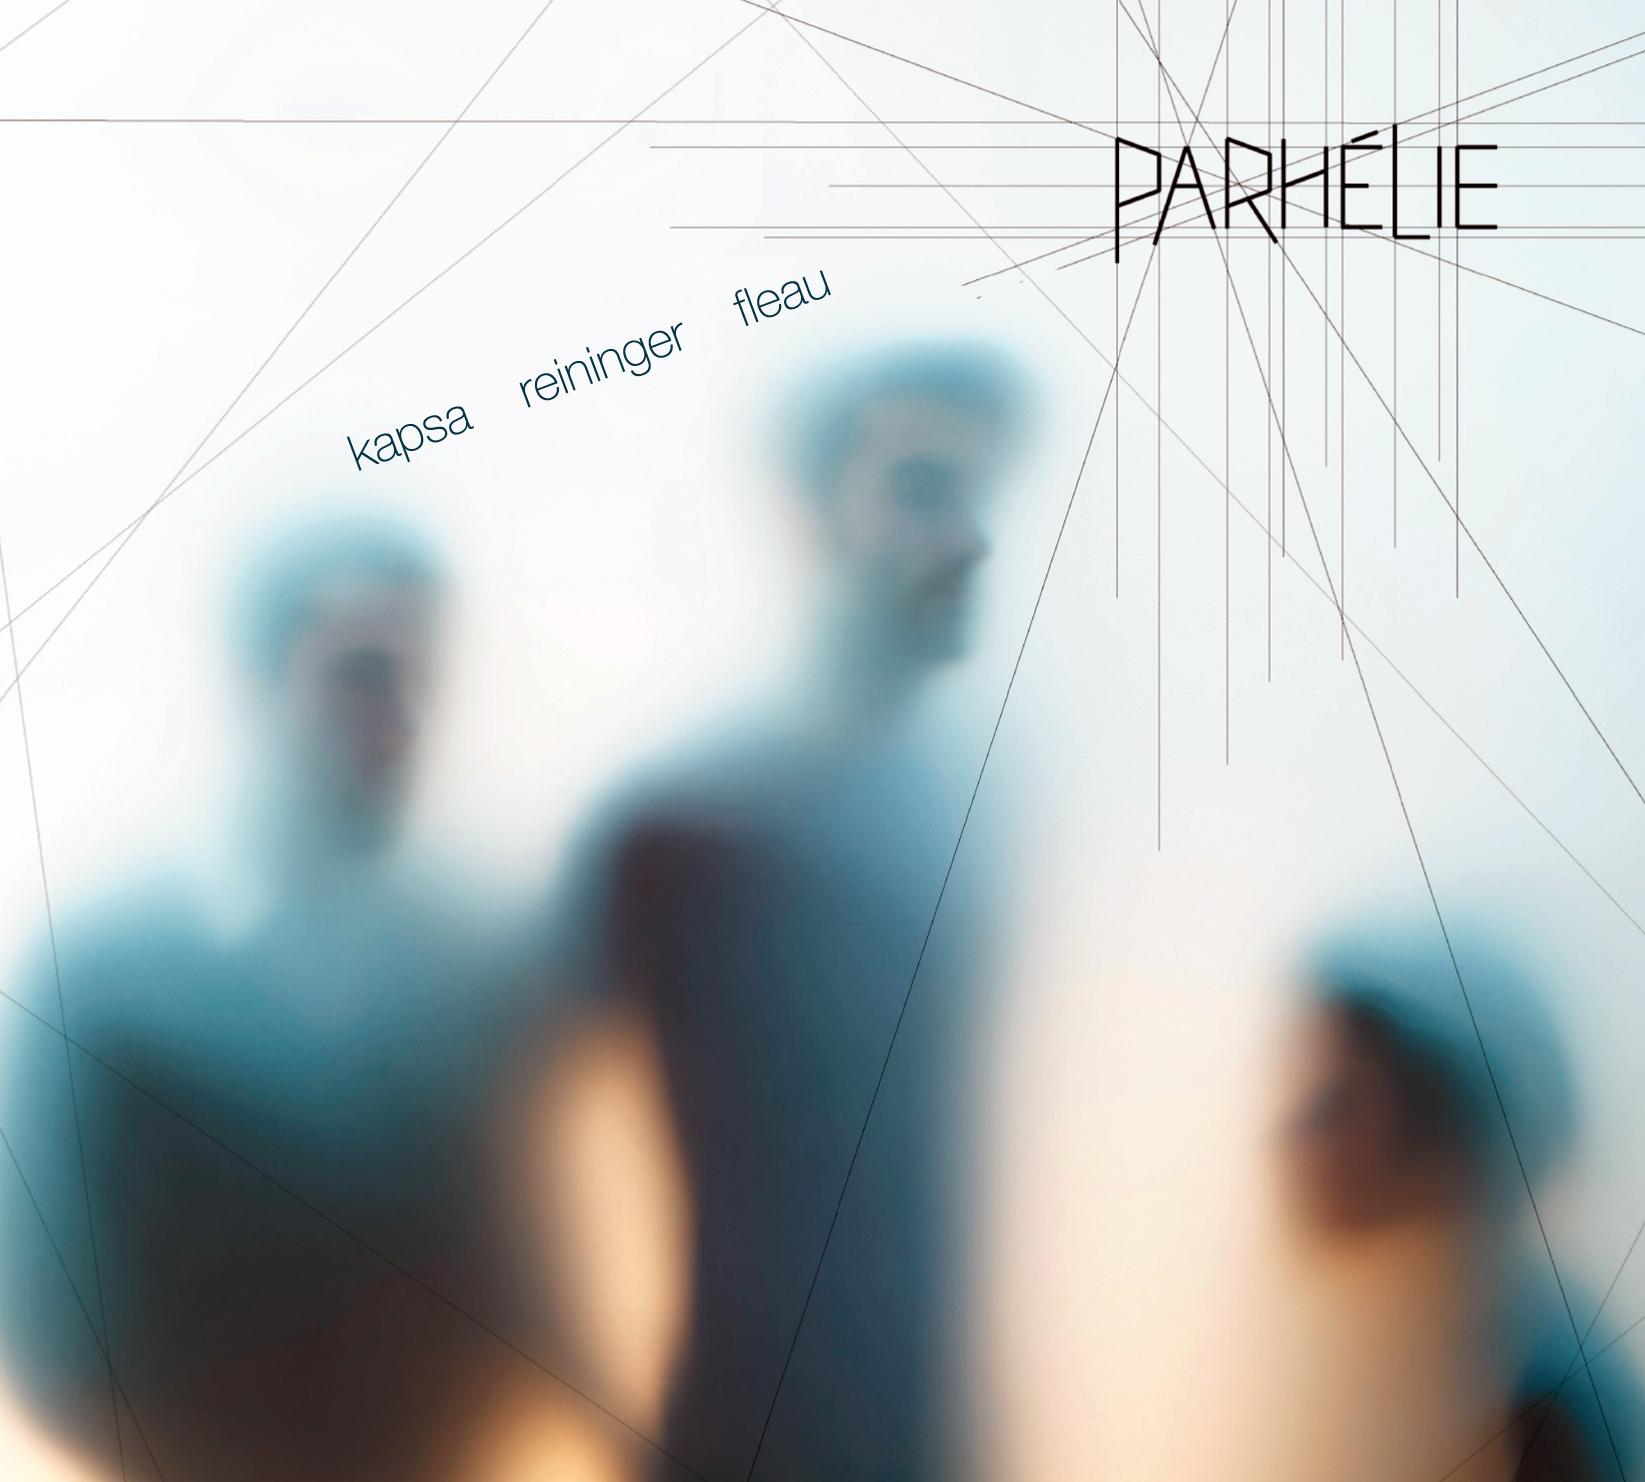 parhelie